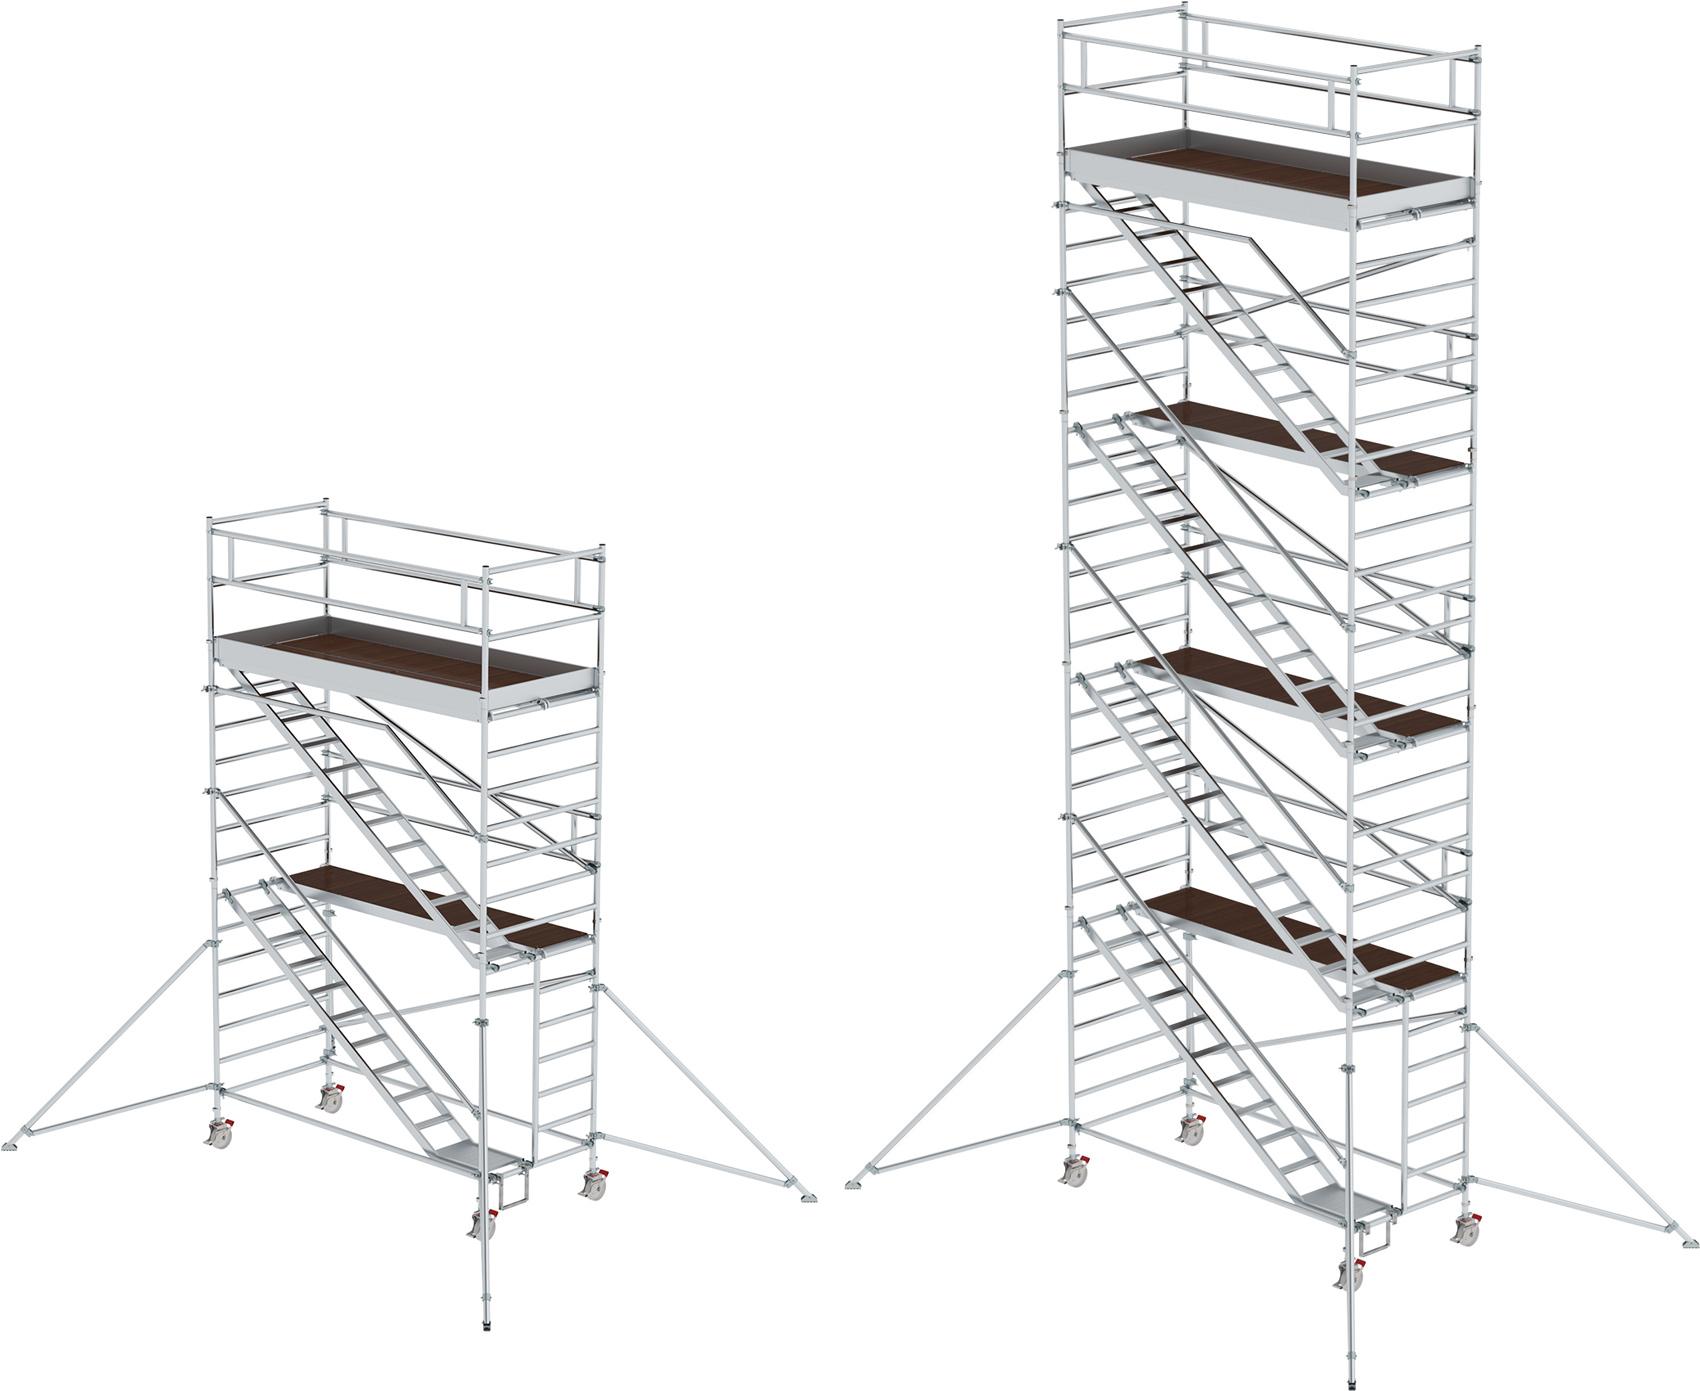 Treppengerüst Günzburger 3,00 x 1,35 m